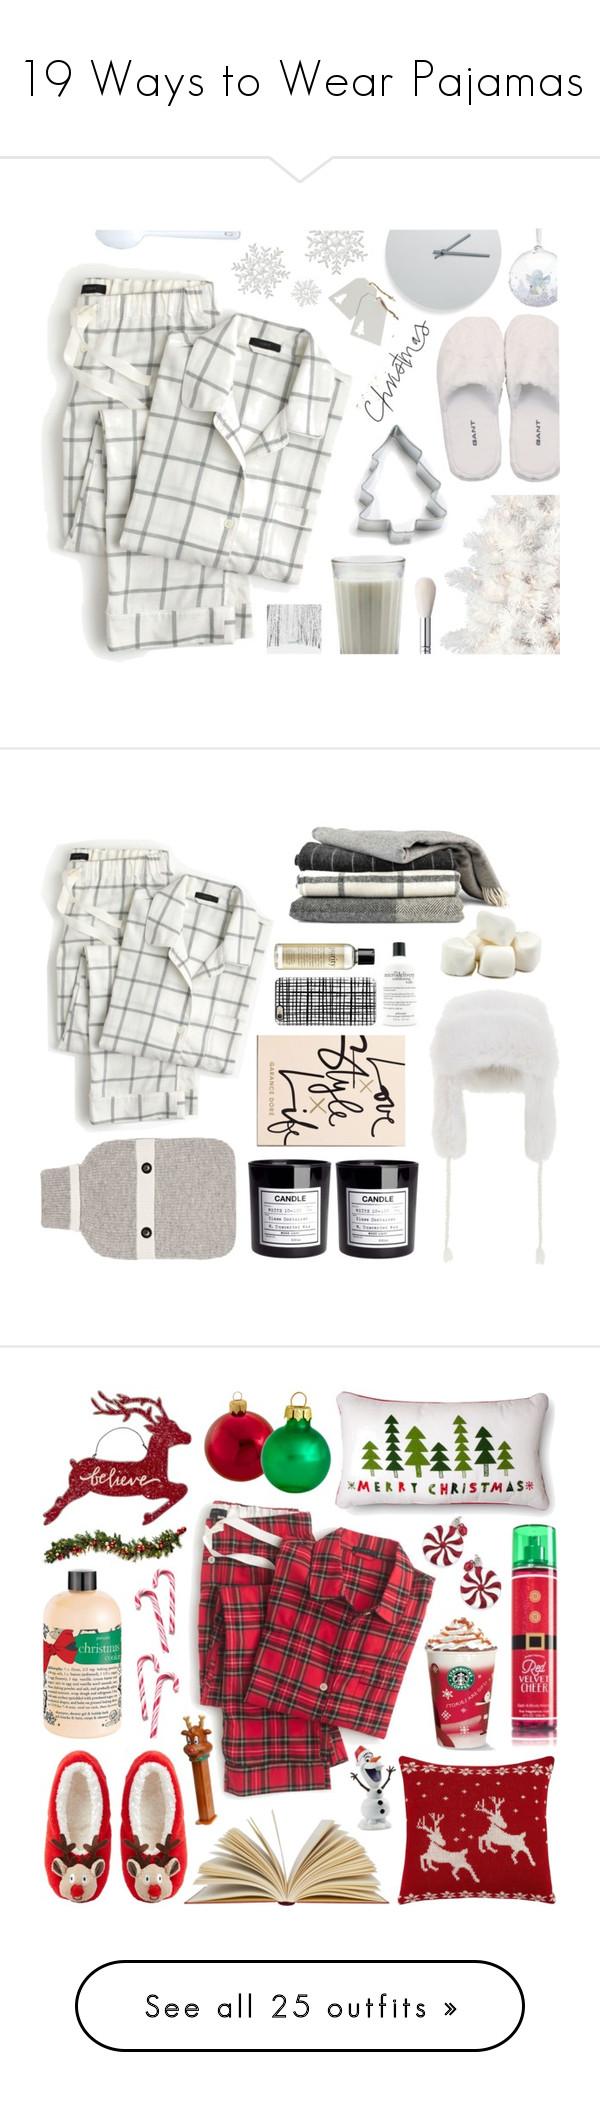 """19 Ways to Wear Pajamas"" by polyvore-editorial ❤ liked on Polyvore featuring pajamas, waystowear, J.Crew, GANT, Ann Clark, Swarovski, Menu, Workshop, H&M and Jack Wills"